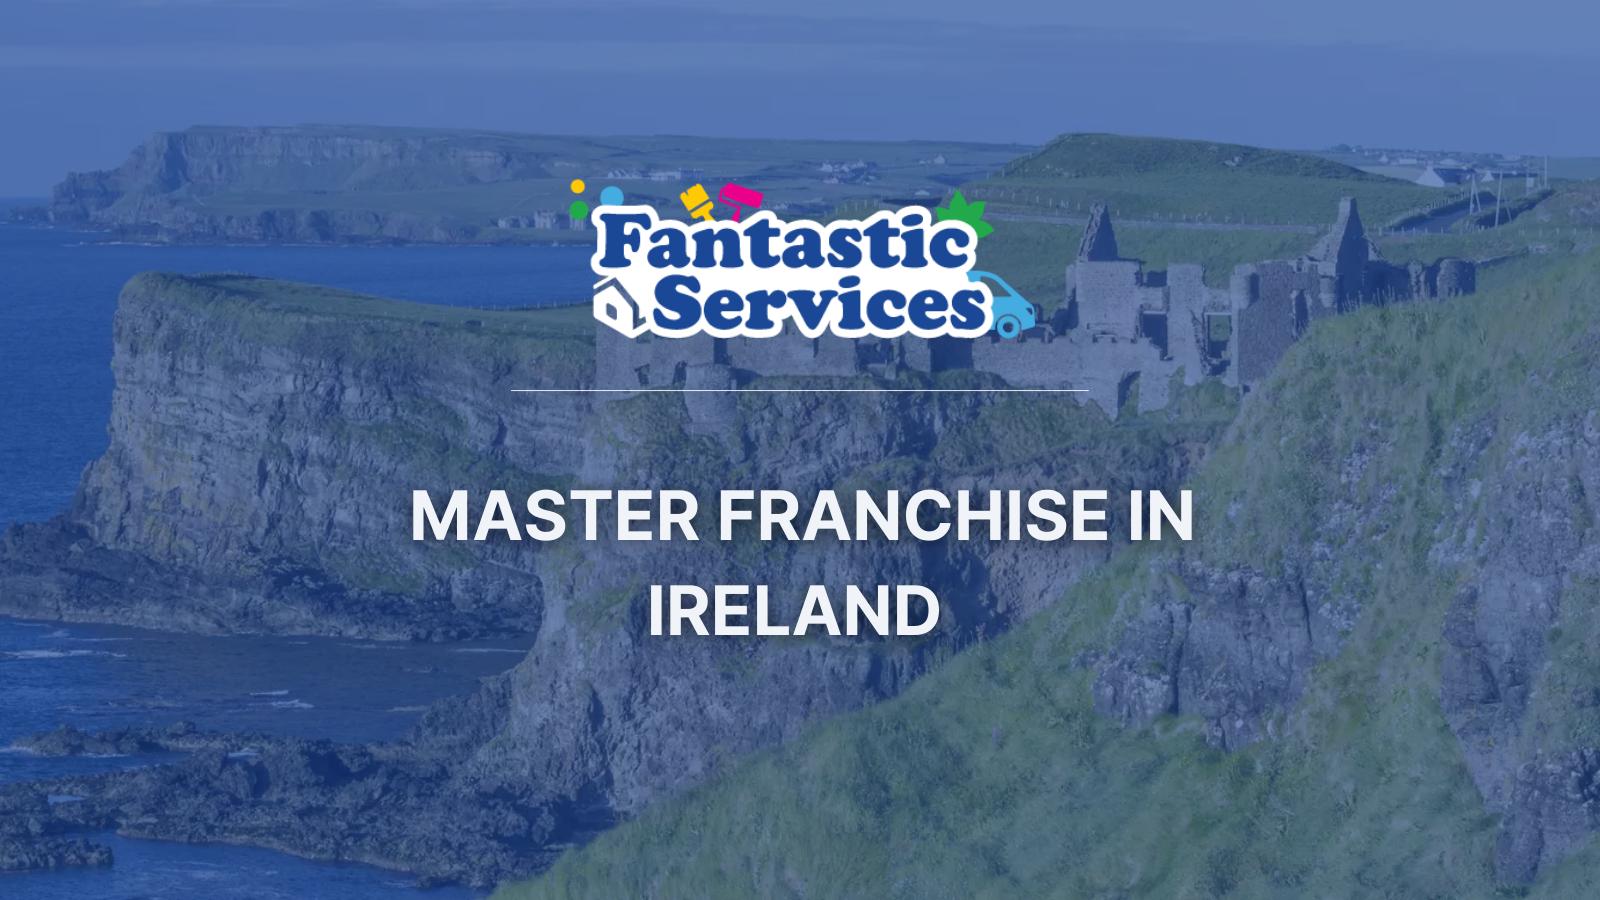 Fantastic Services expands across Ireland